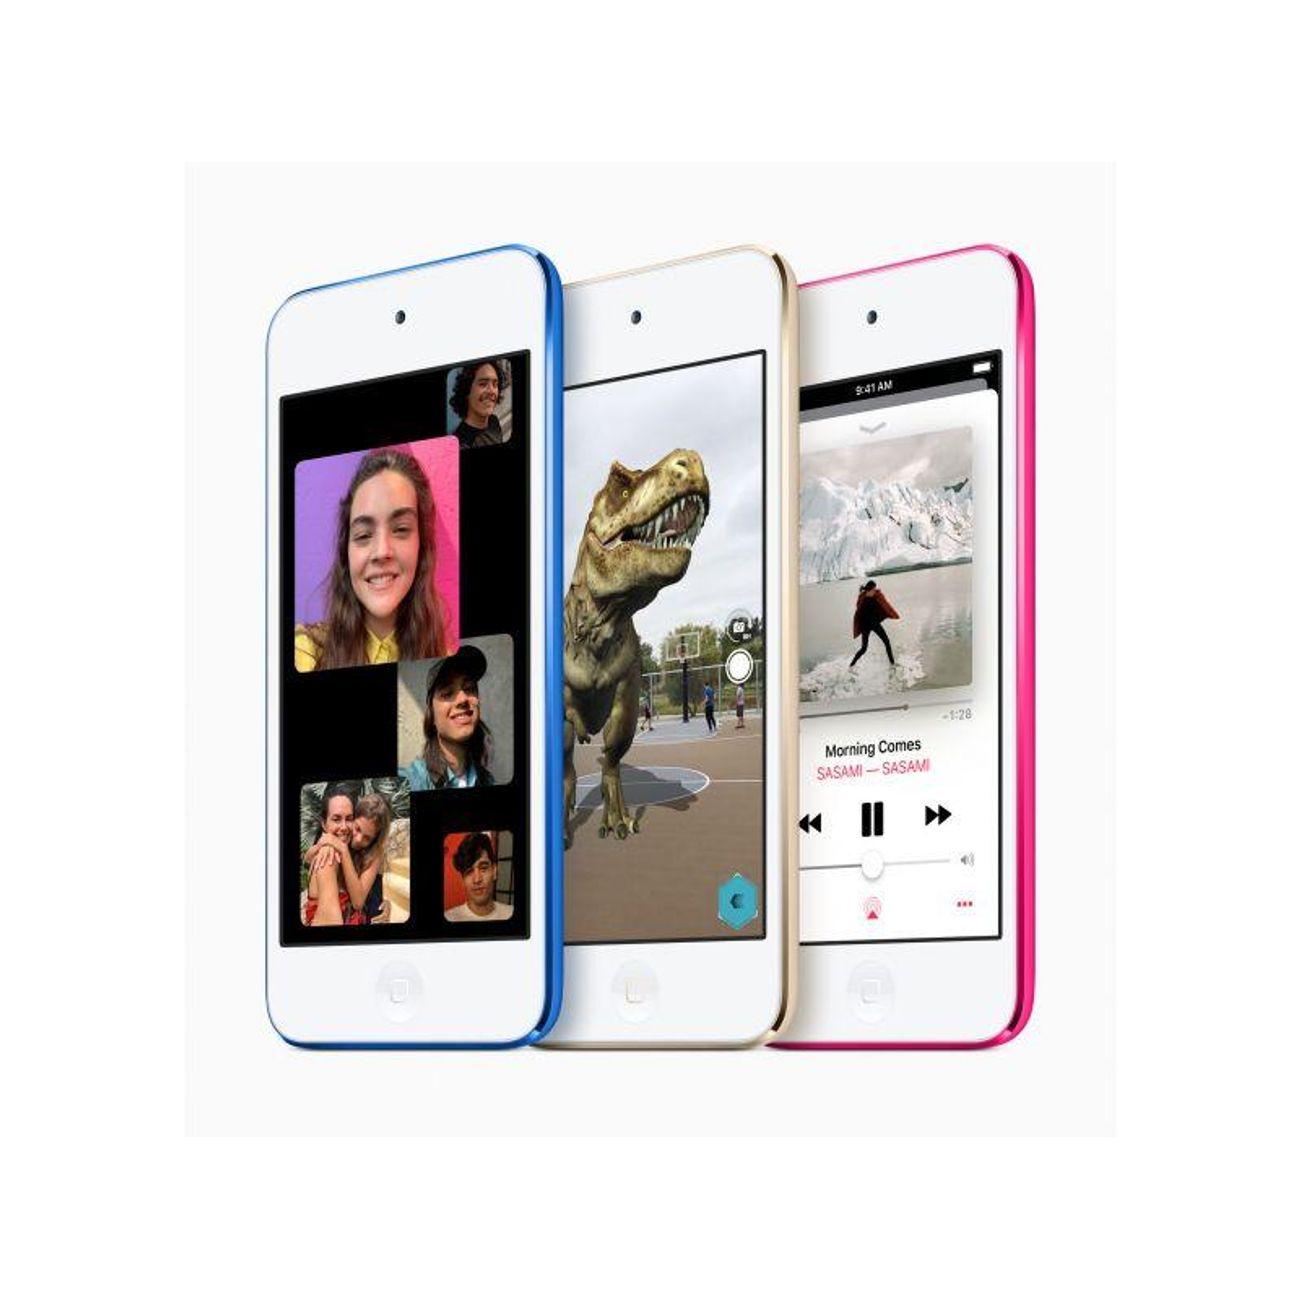 NO NAME Apple iPod touch Gold 128GB 7.Gen. MVJ22FD/A